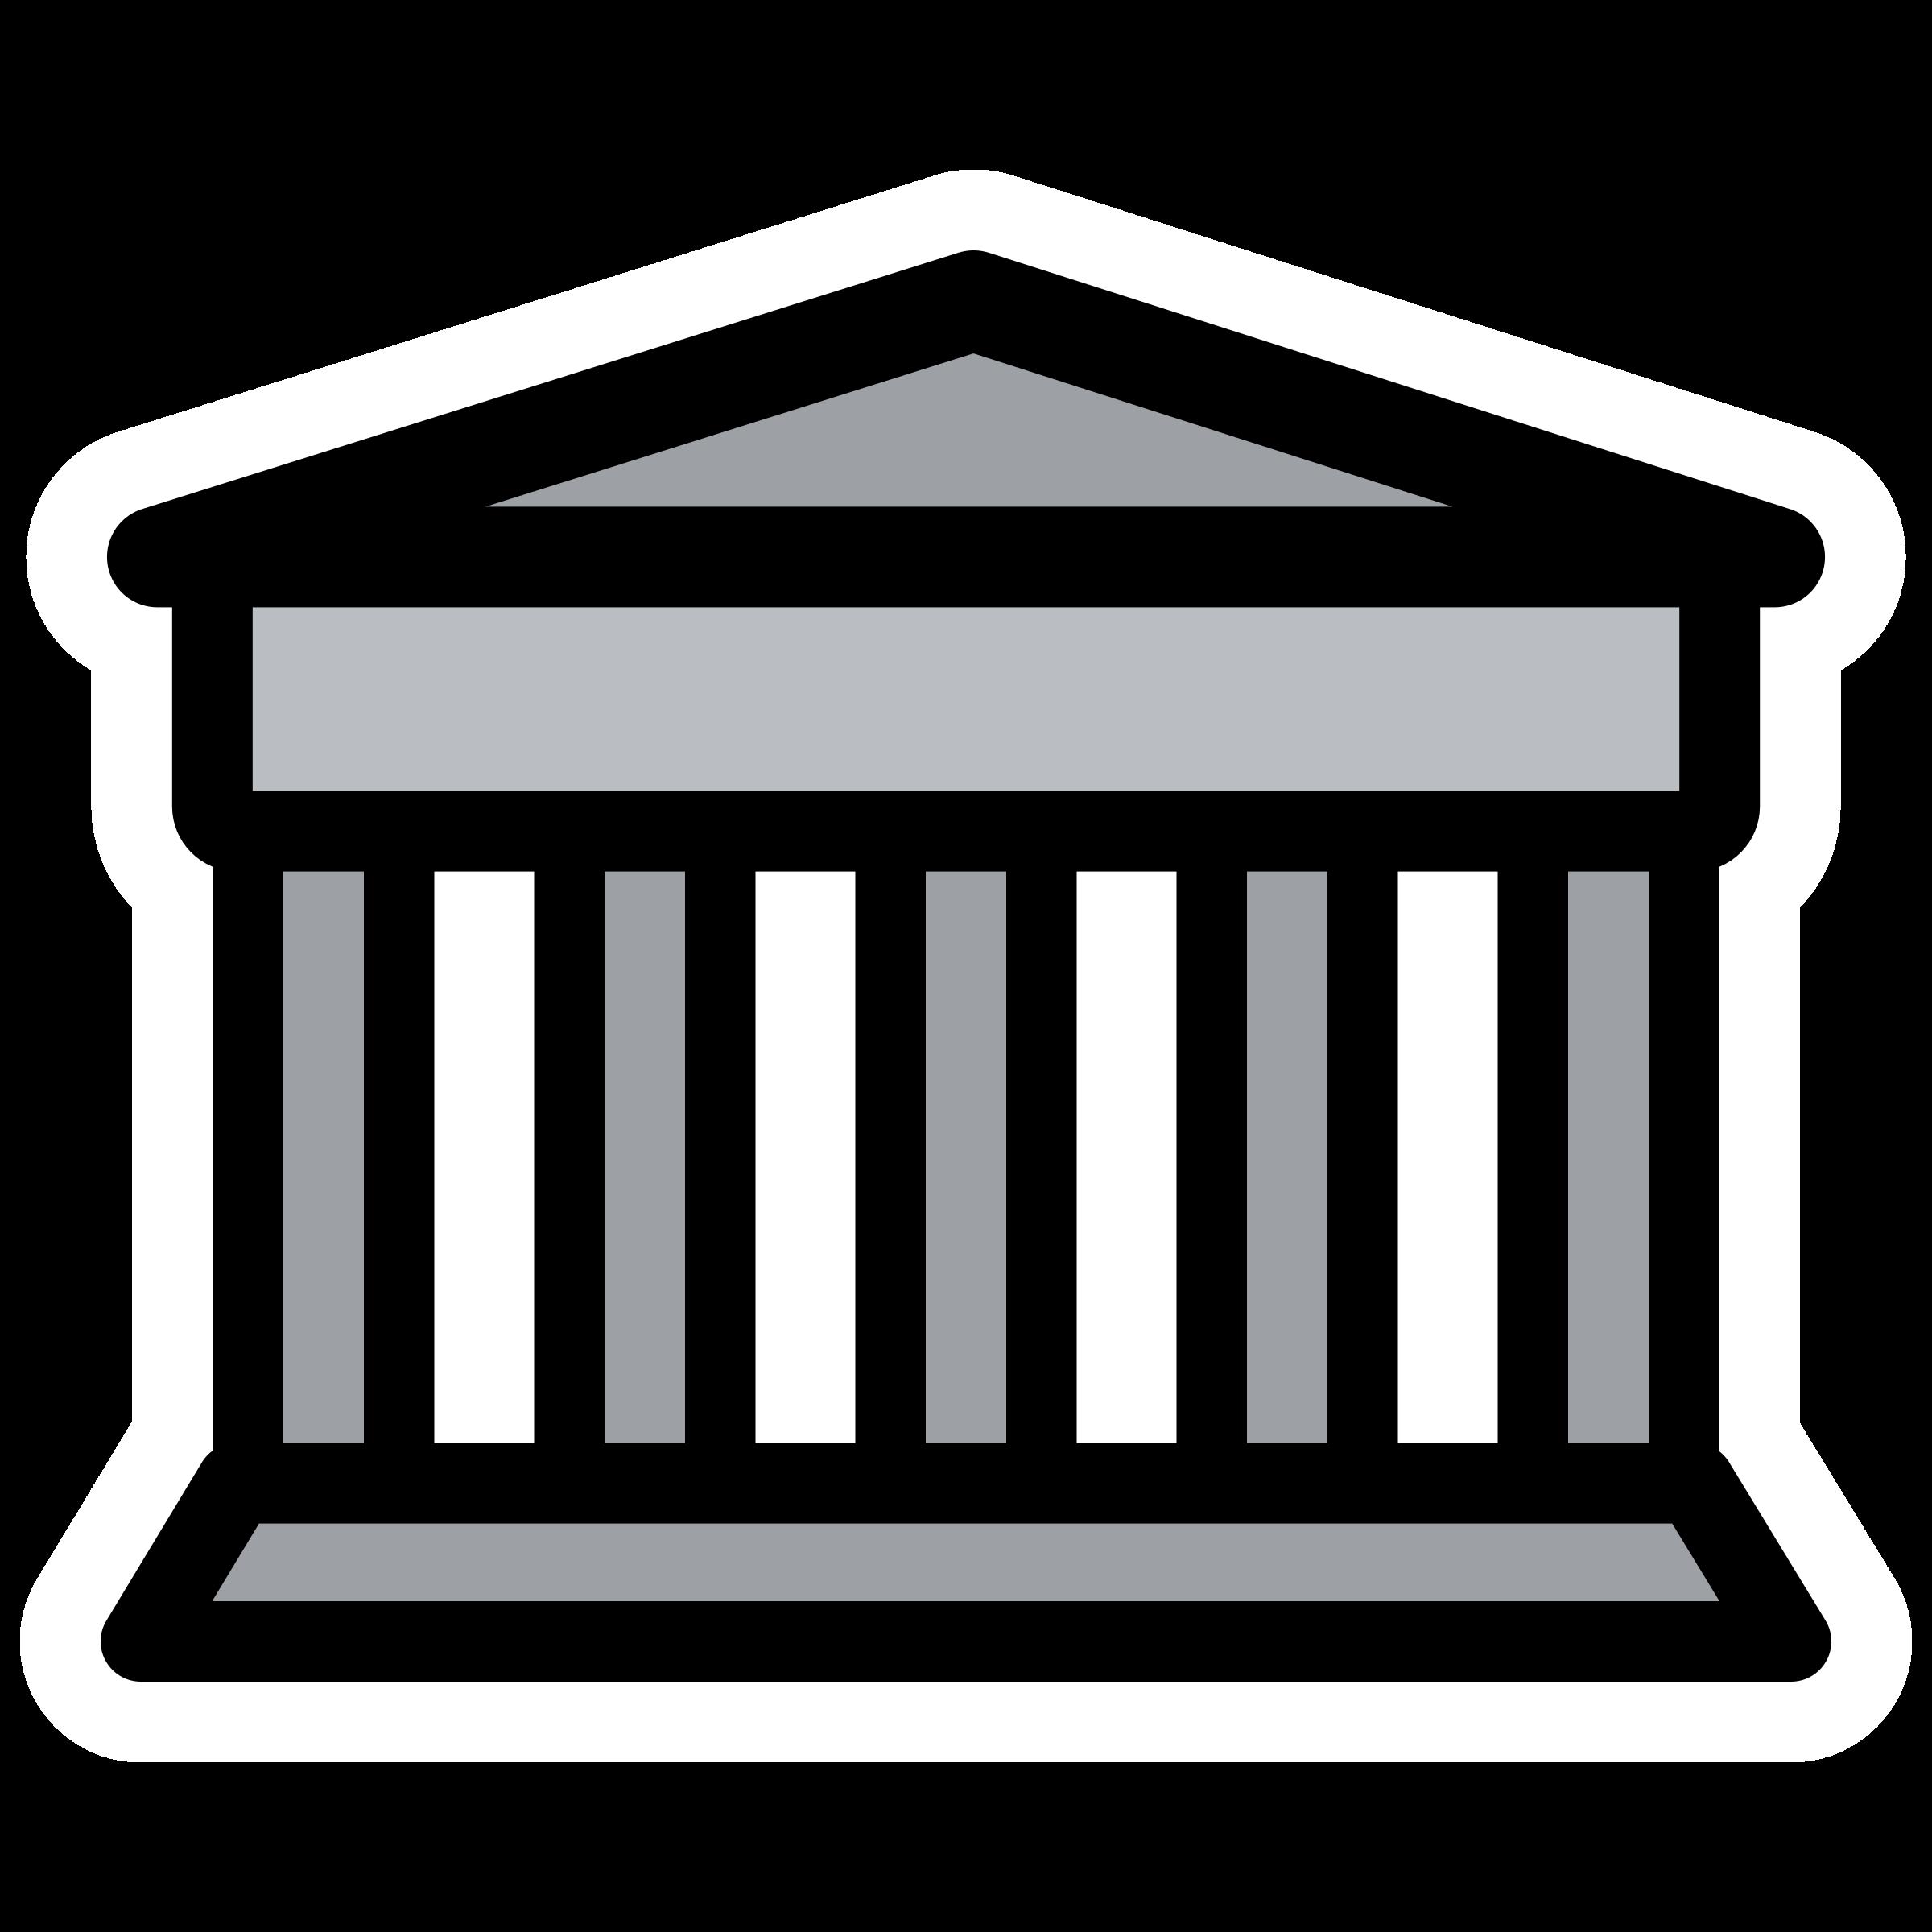 Bank clipart bank clip art image 4